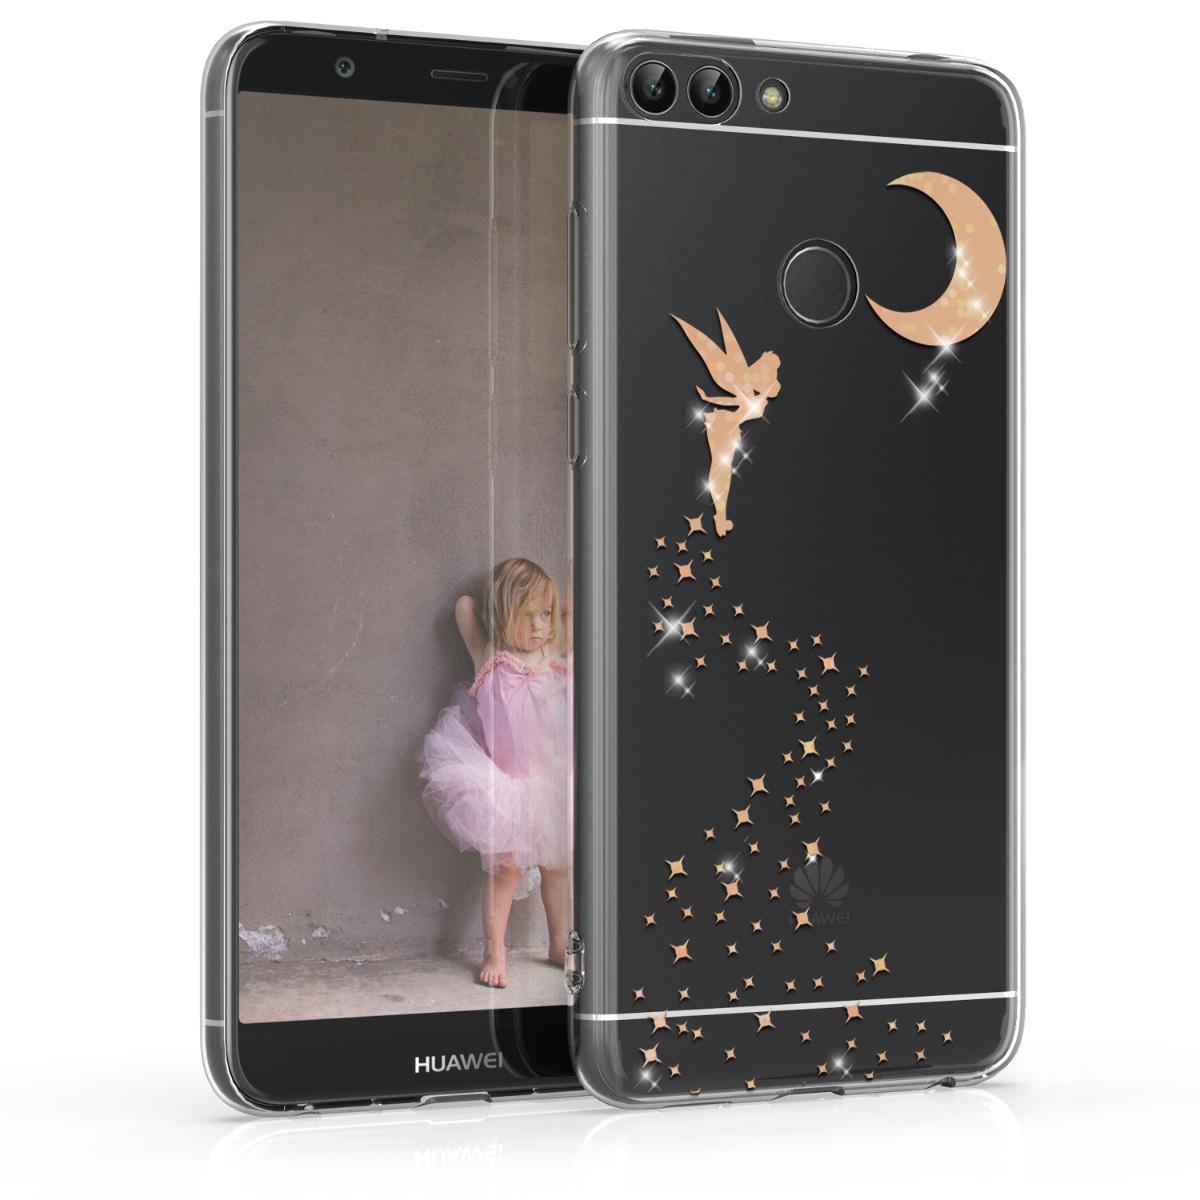 KW Θήκη Σιλικόνης Huawei P Smart - Soft TPU Silicone Cover - Rose Gold / Transparent (45415.15)